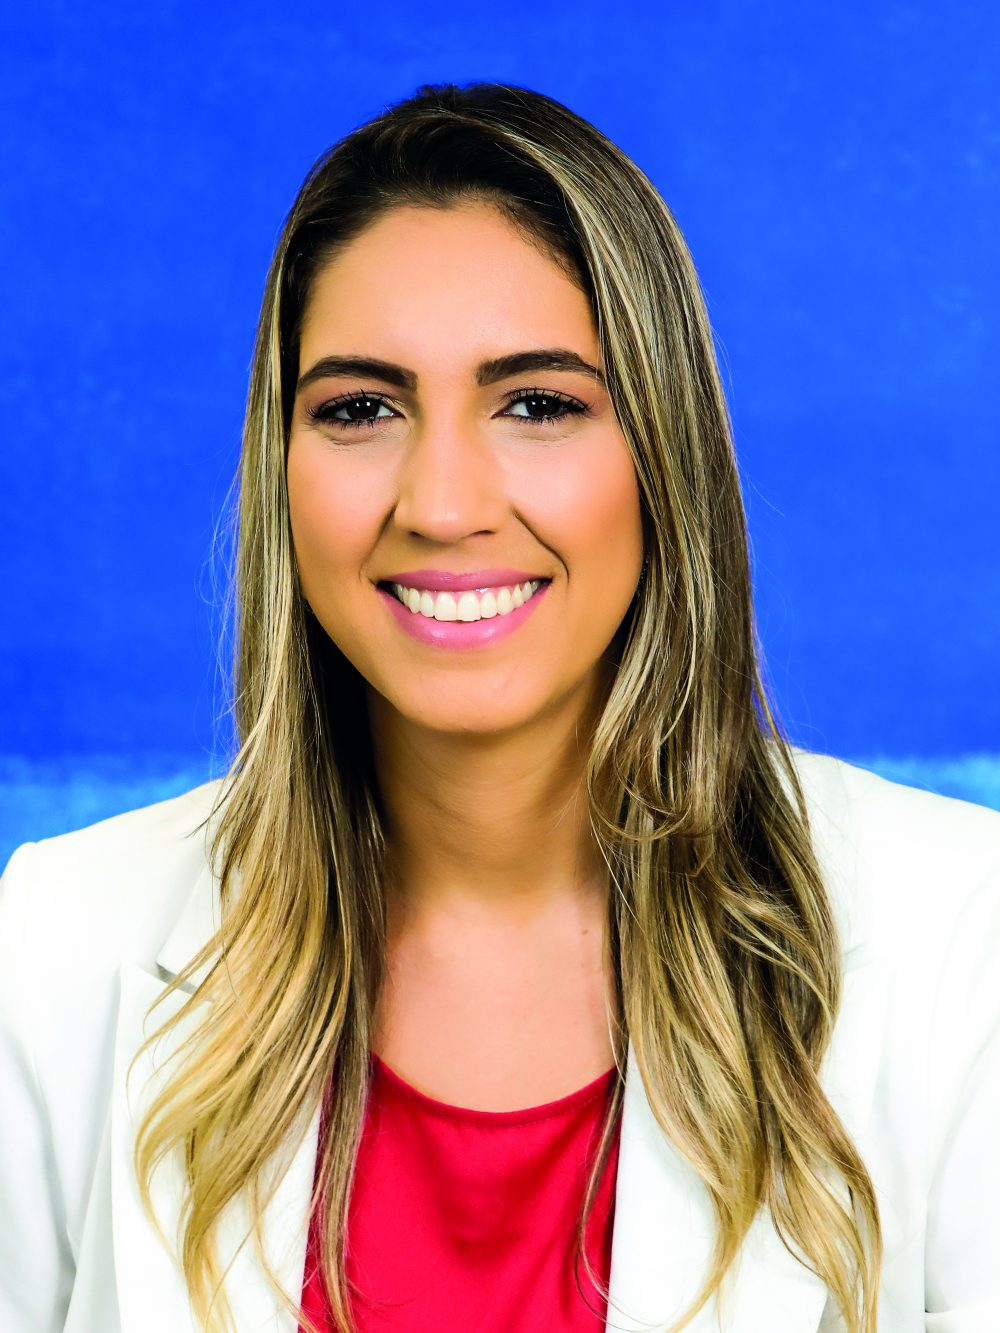 Larissa Waters - Wikipedia